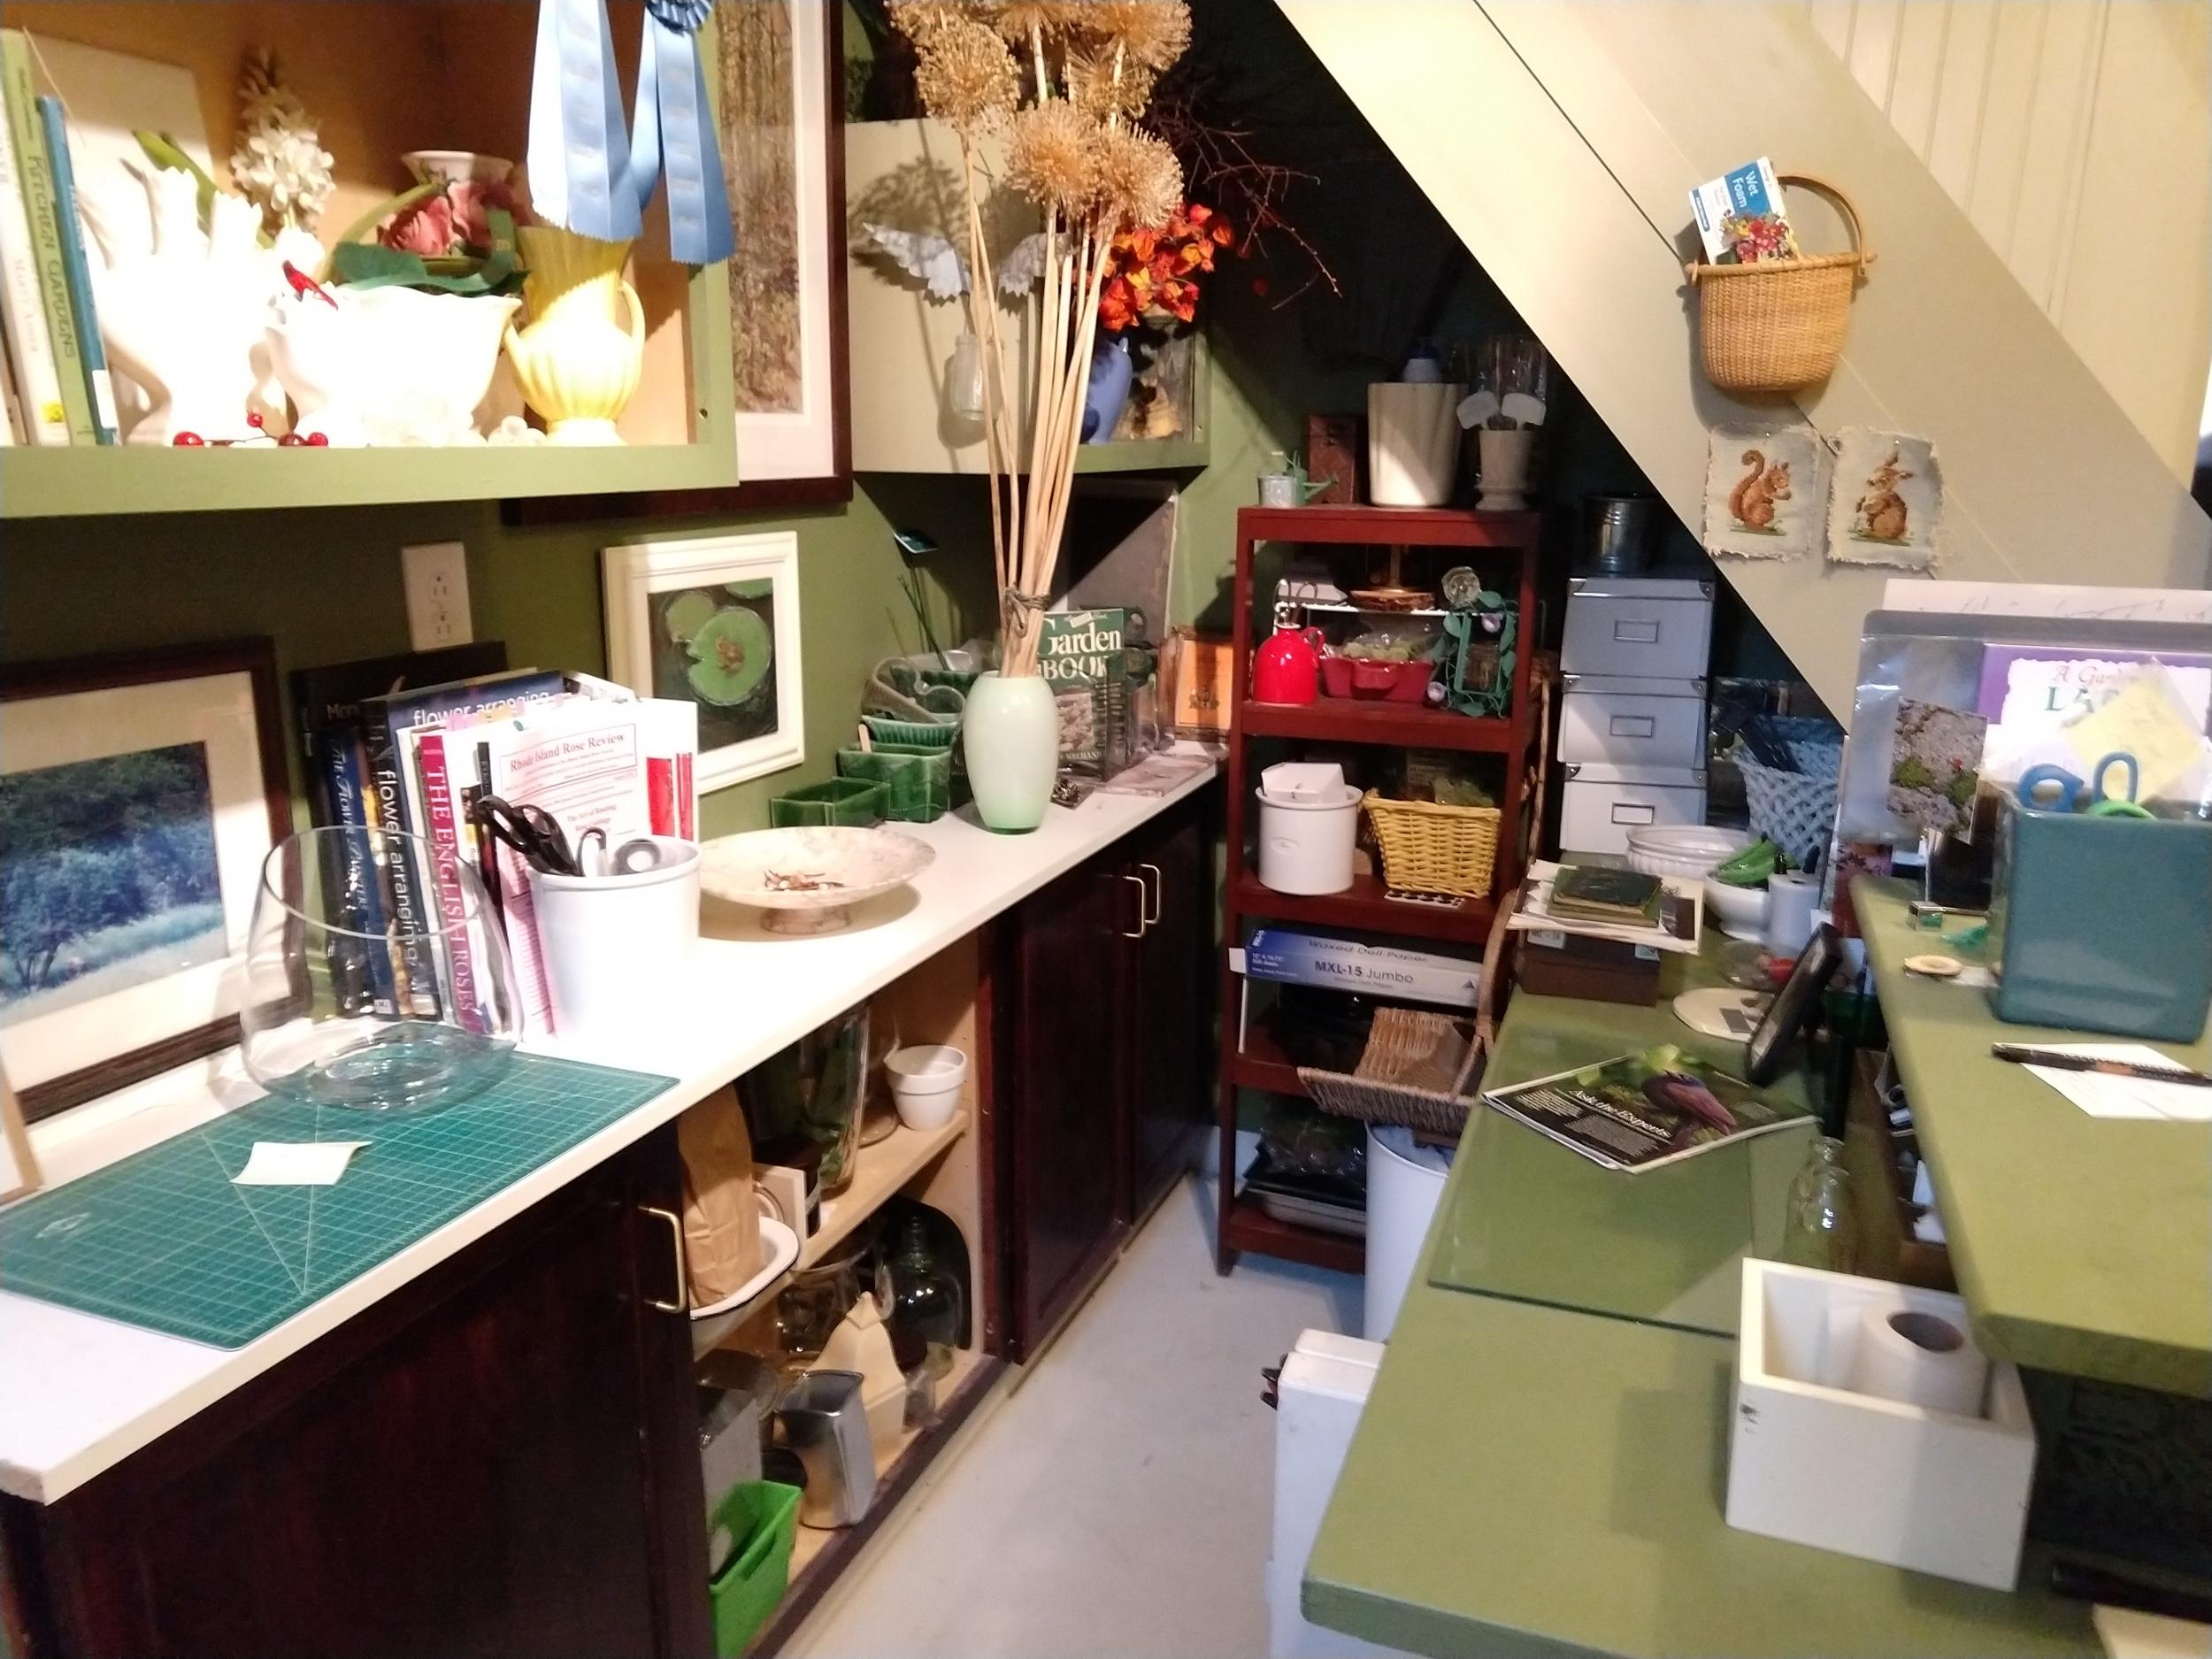 Basement gardening studio Photo by Jessica Jennings